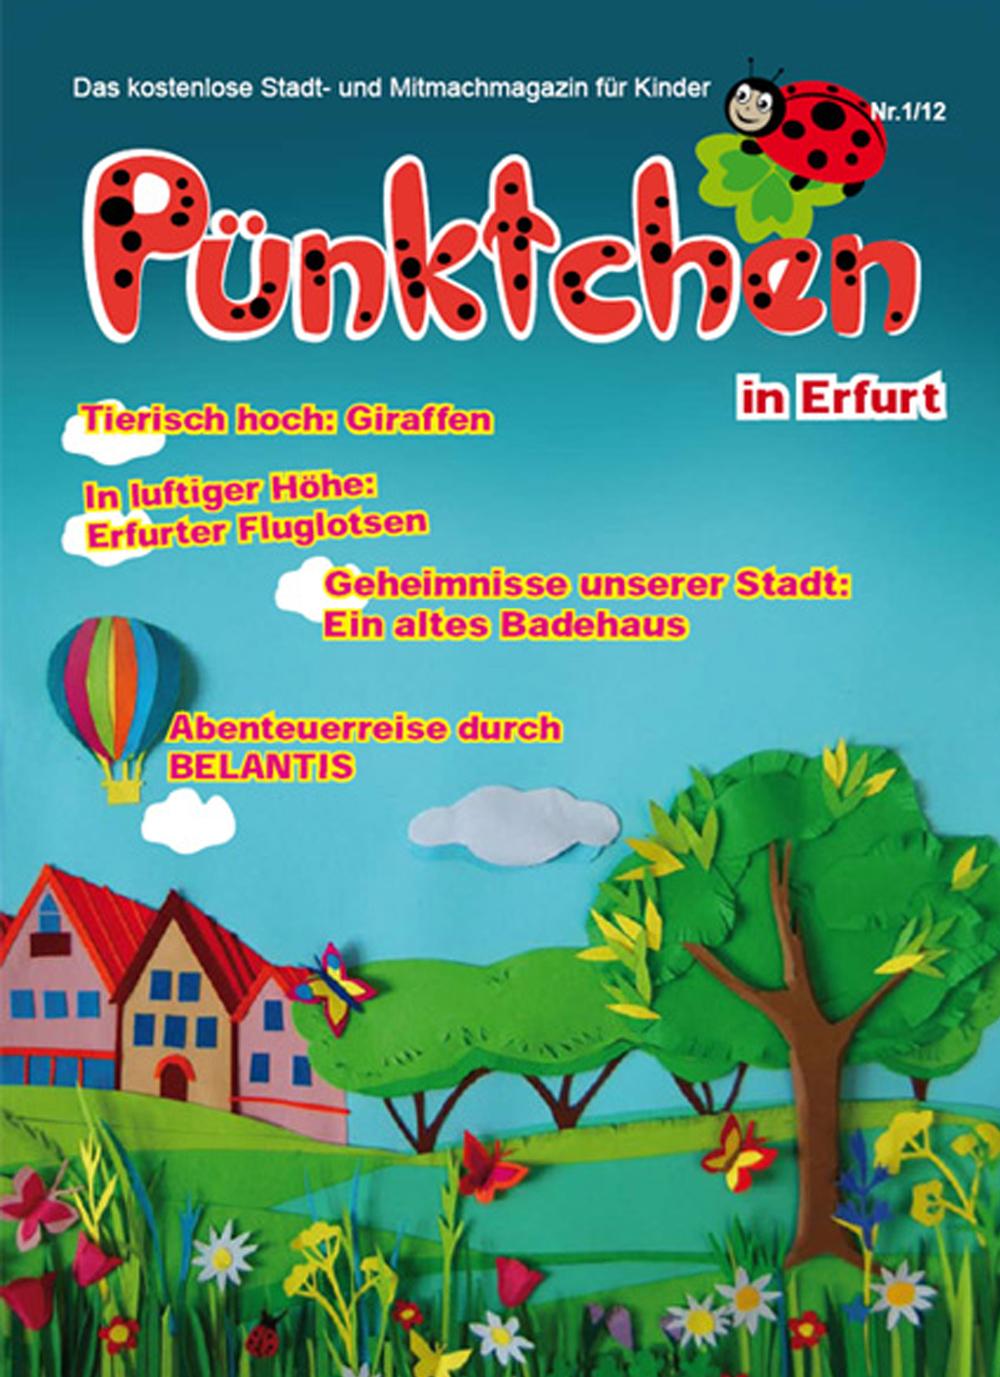 p_illu_puentkchen_1_1